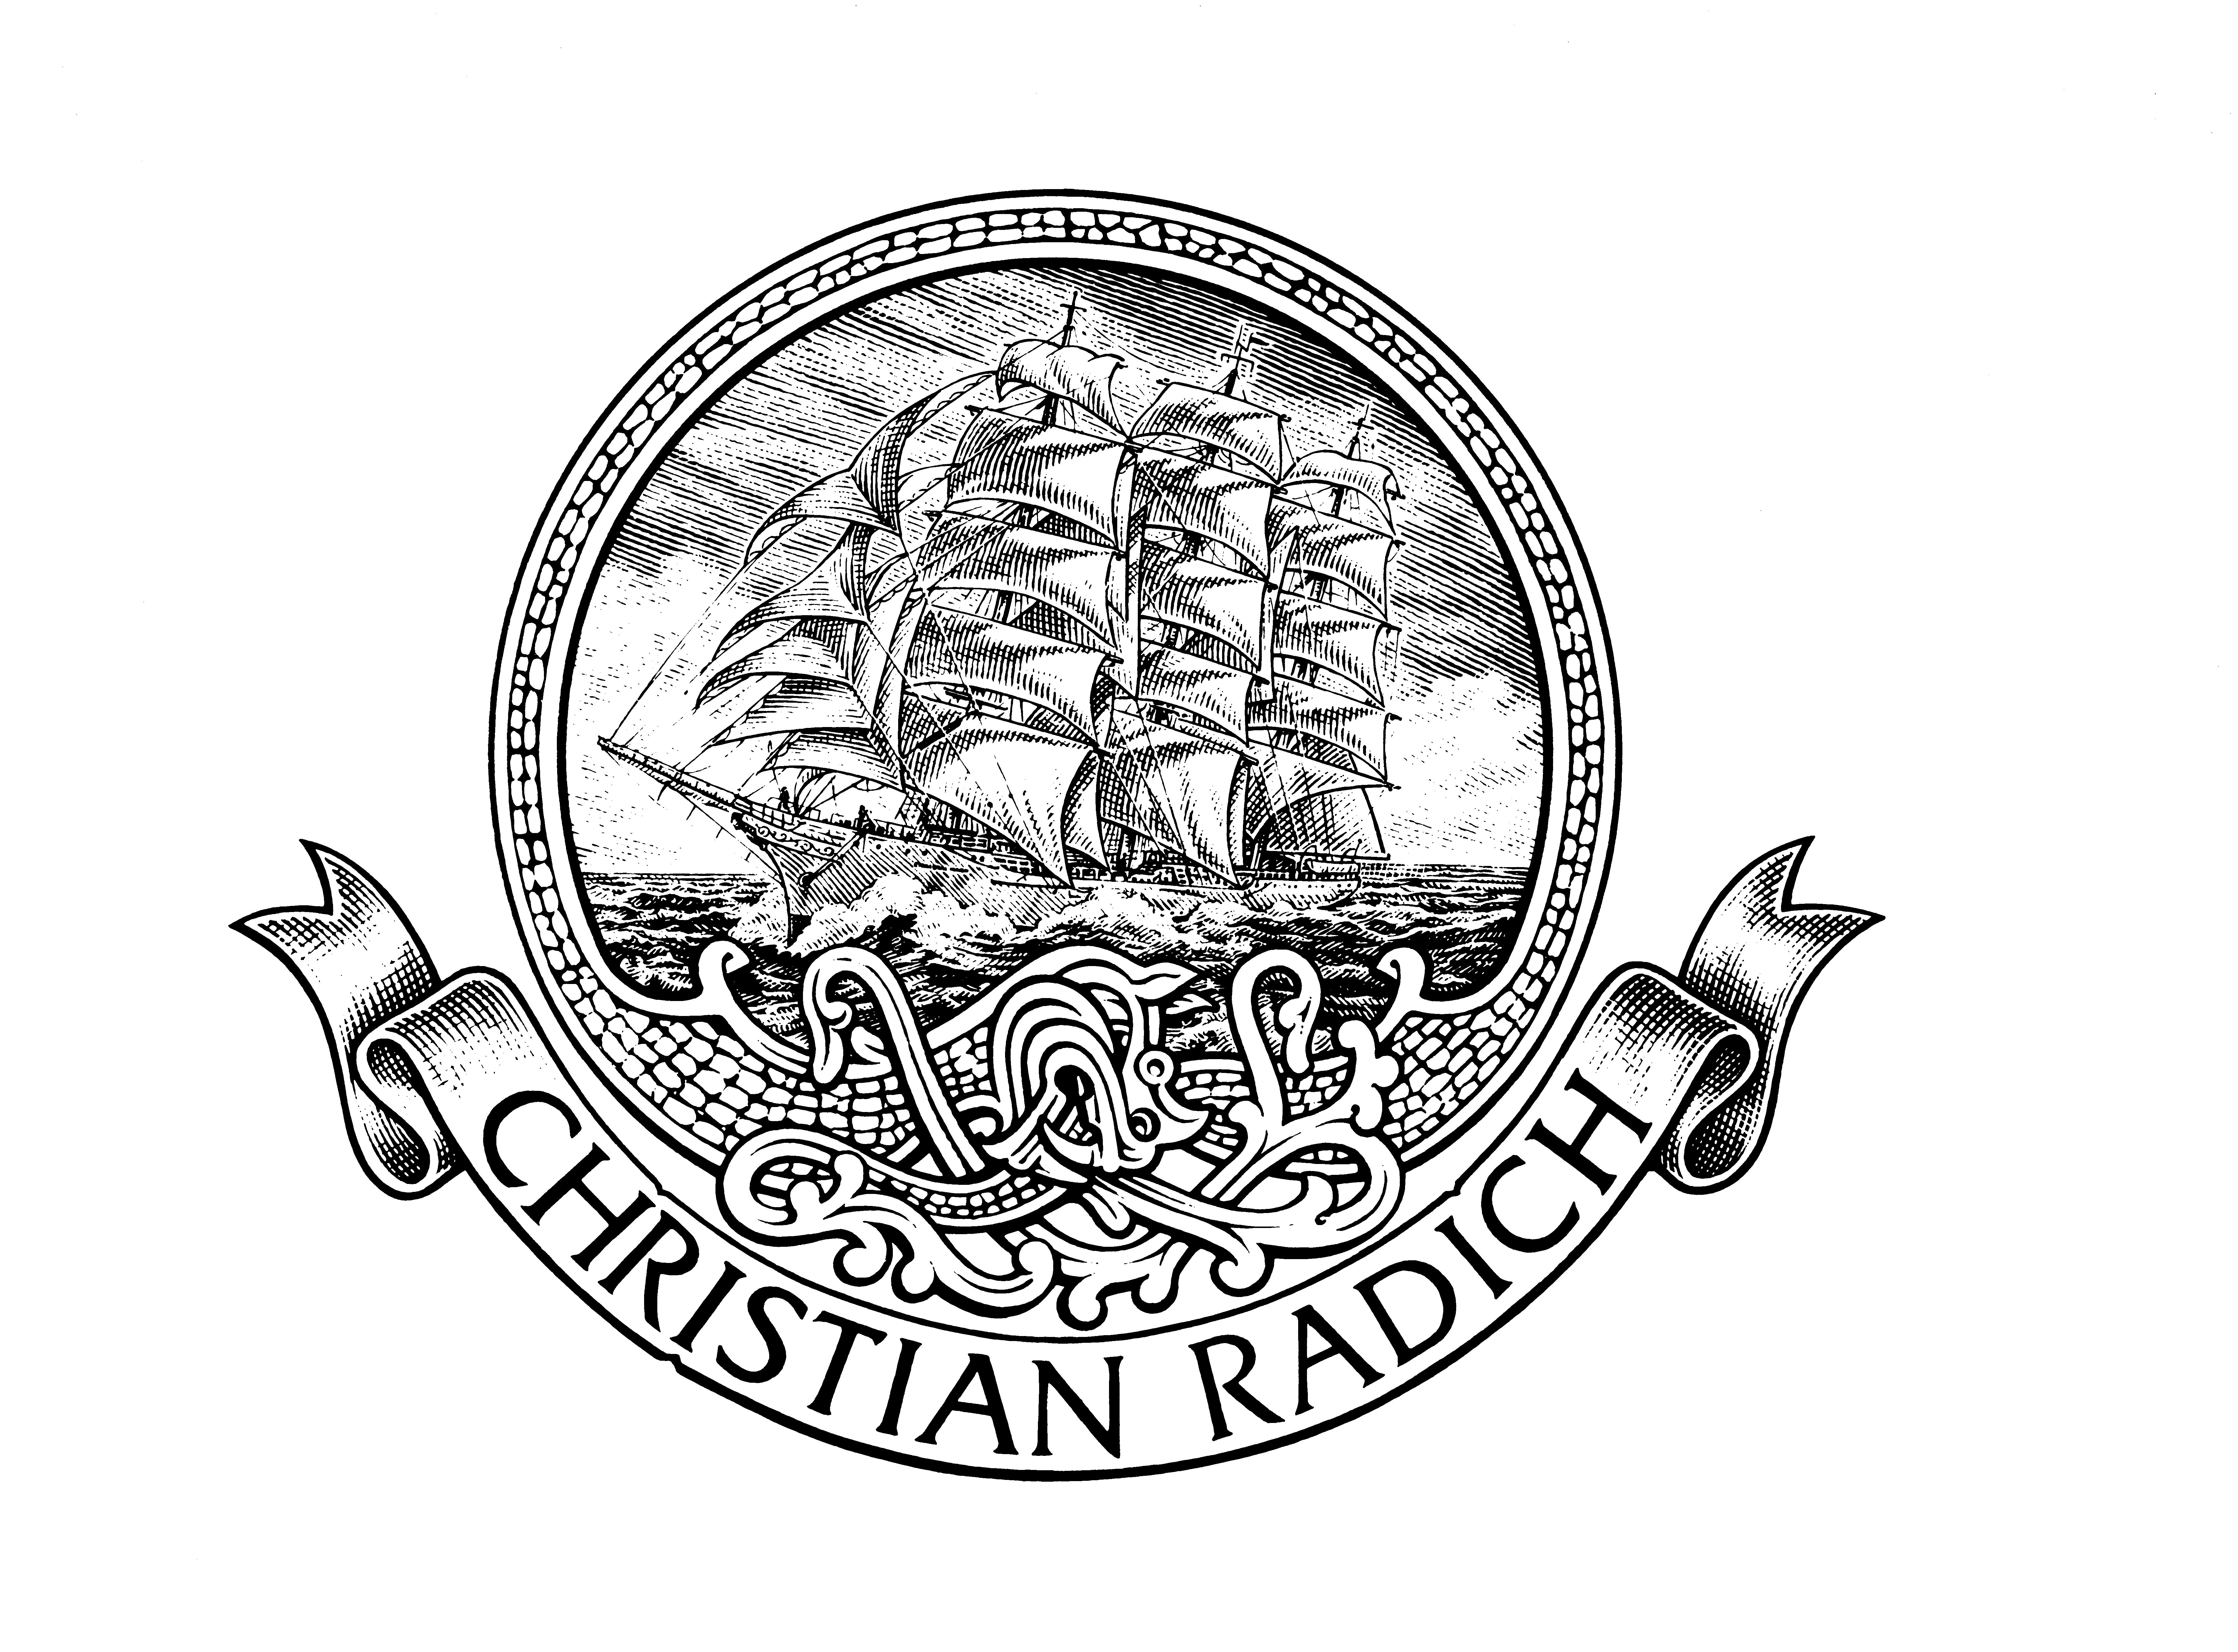 Chritian Radic logo